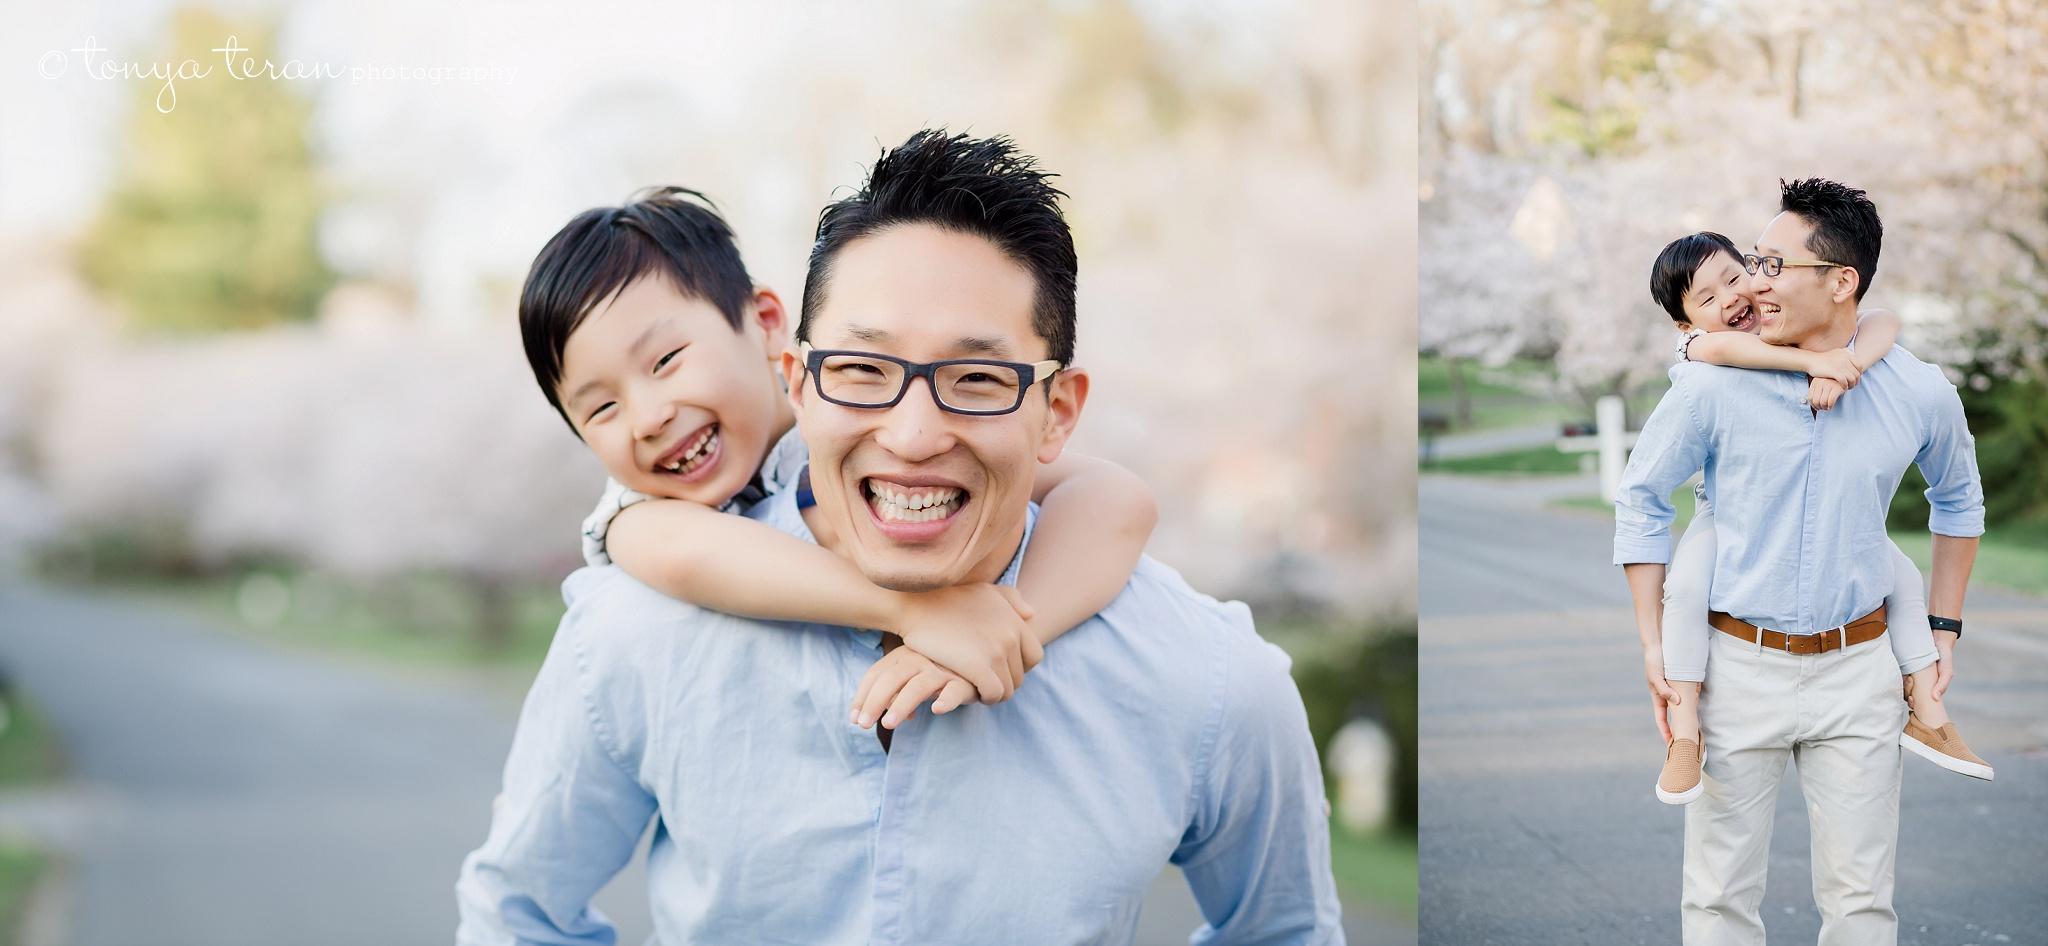 Cherry Blossom Tree Session | Tonya Teran Photography, Potomac, MD Newborn, Baby and Family Photographer